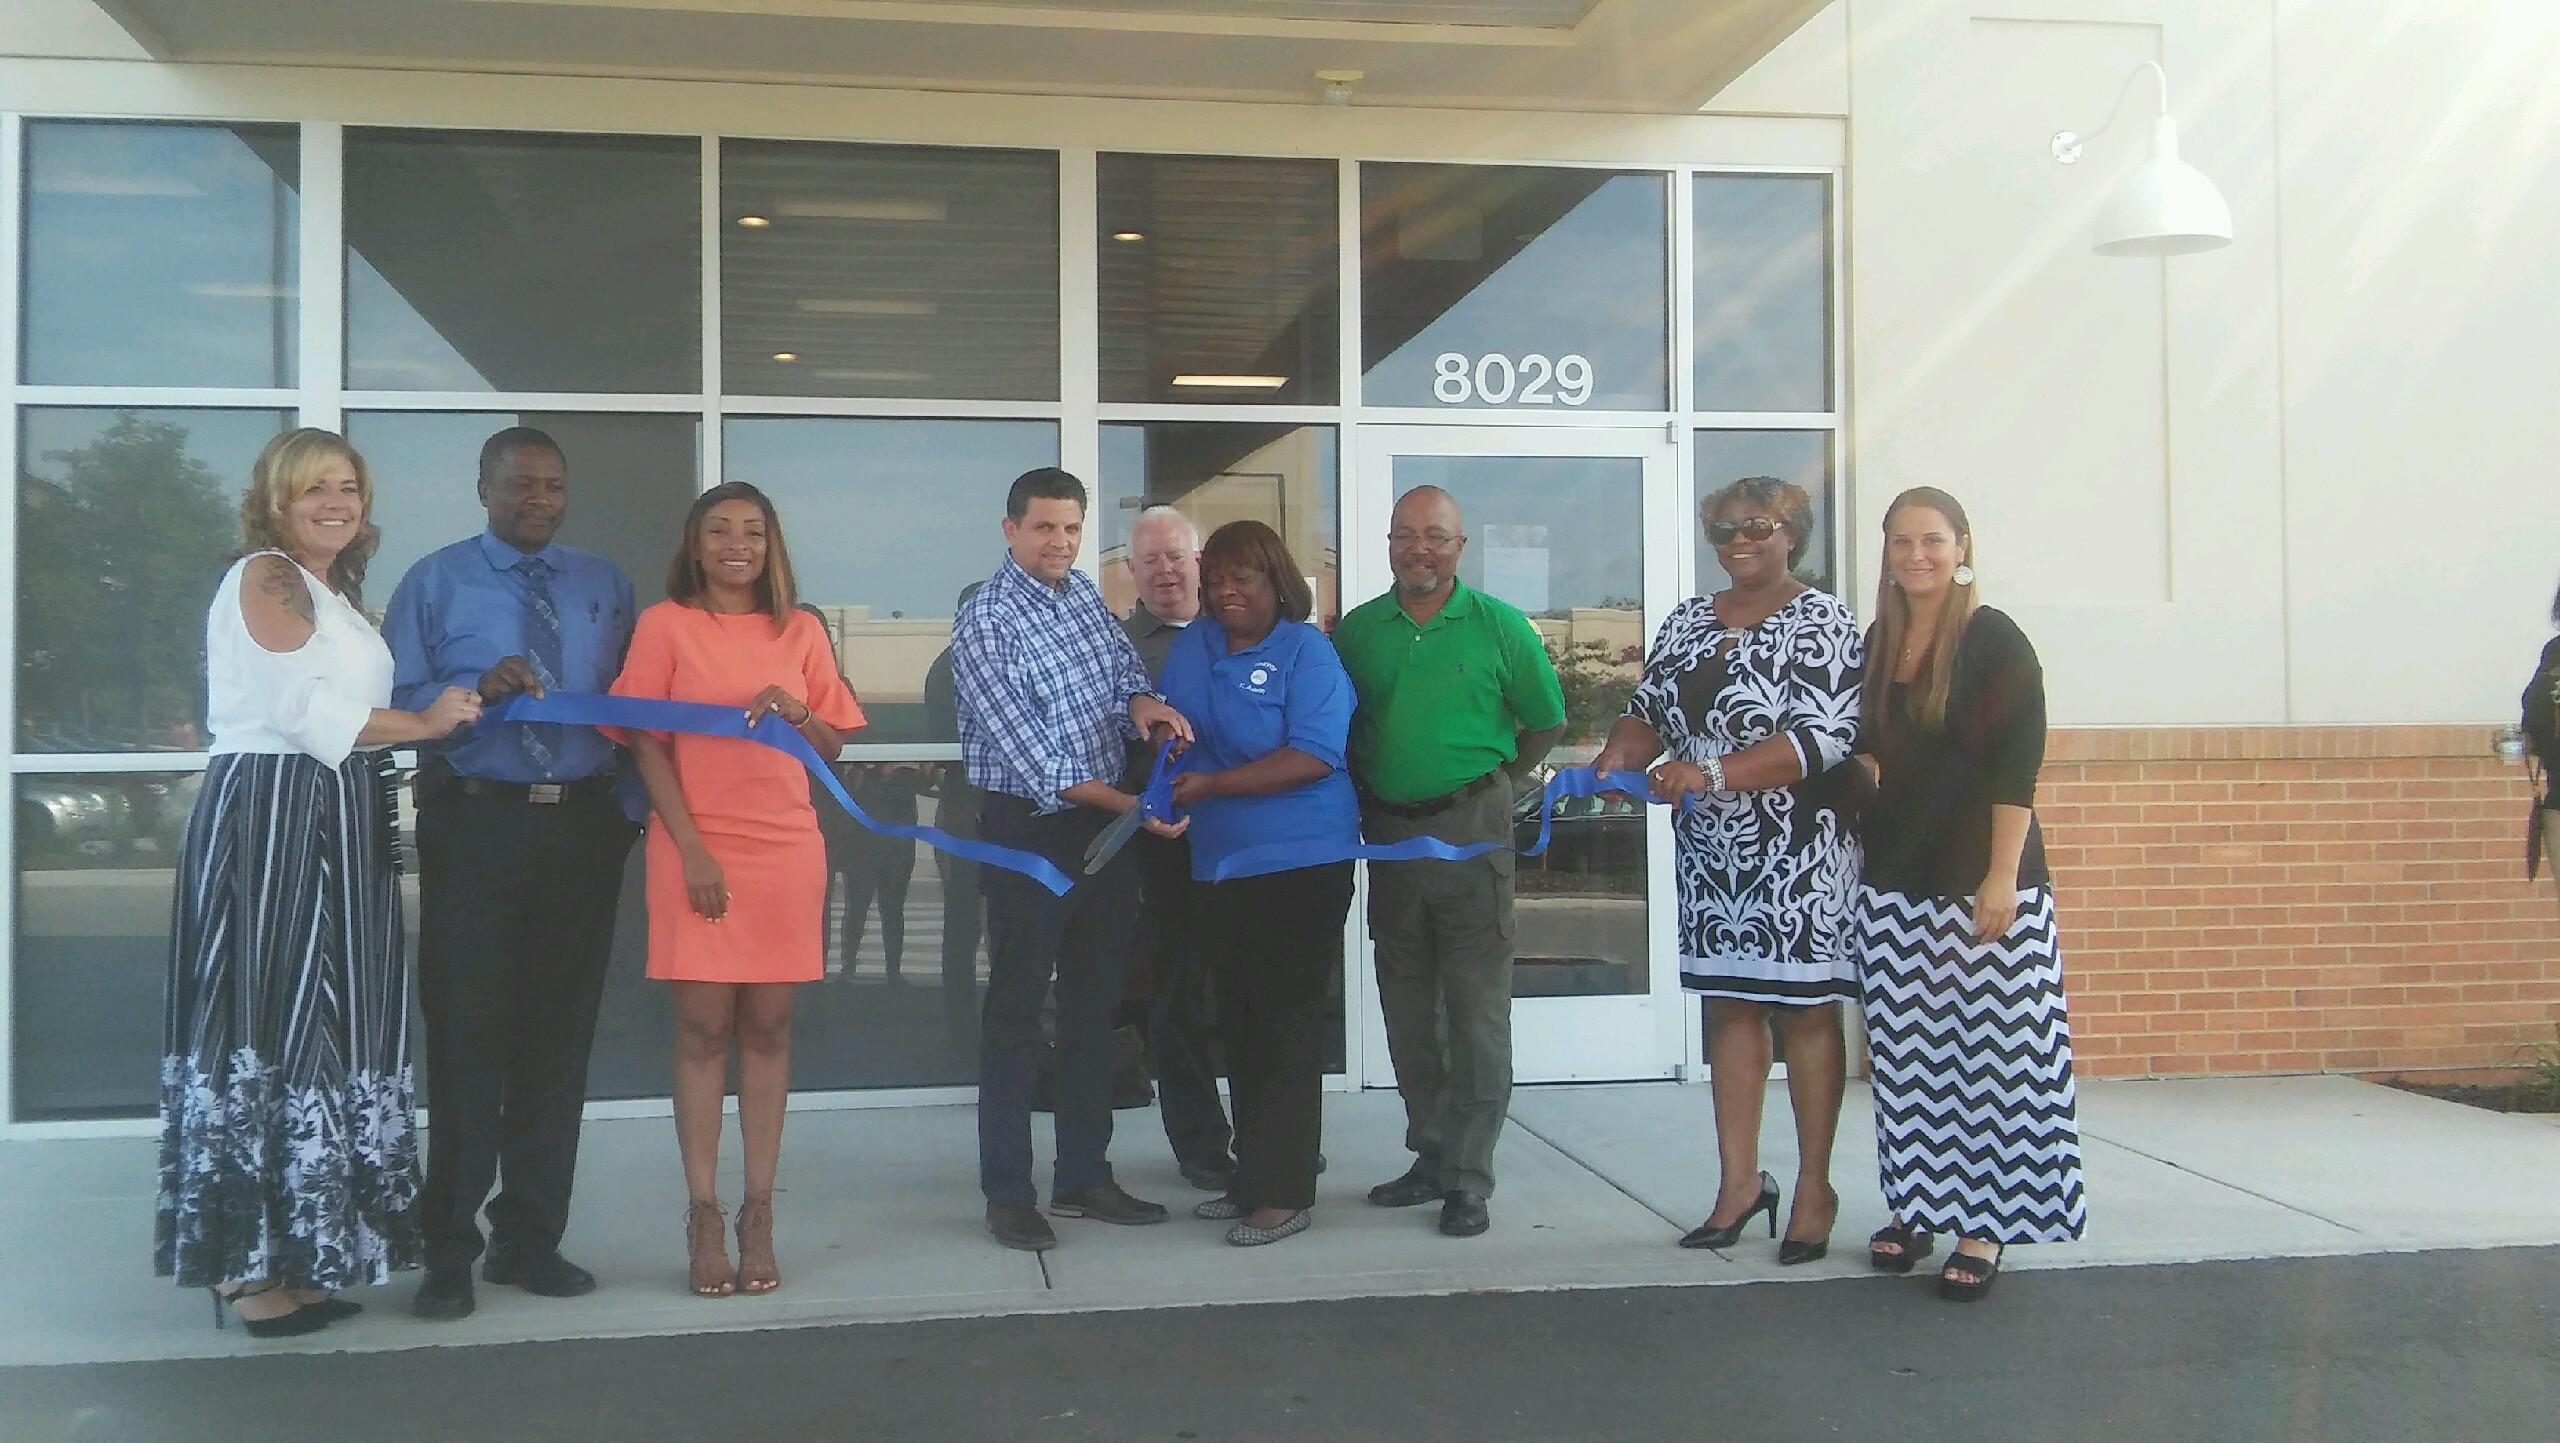 City of Jennings - Grand Opening for DaVita Dialysis Center